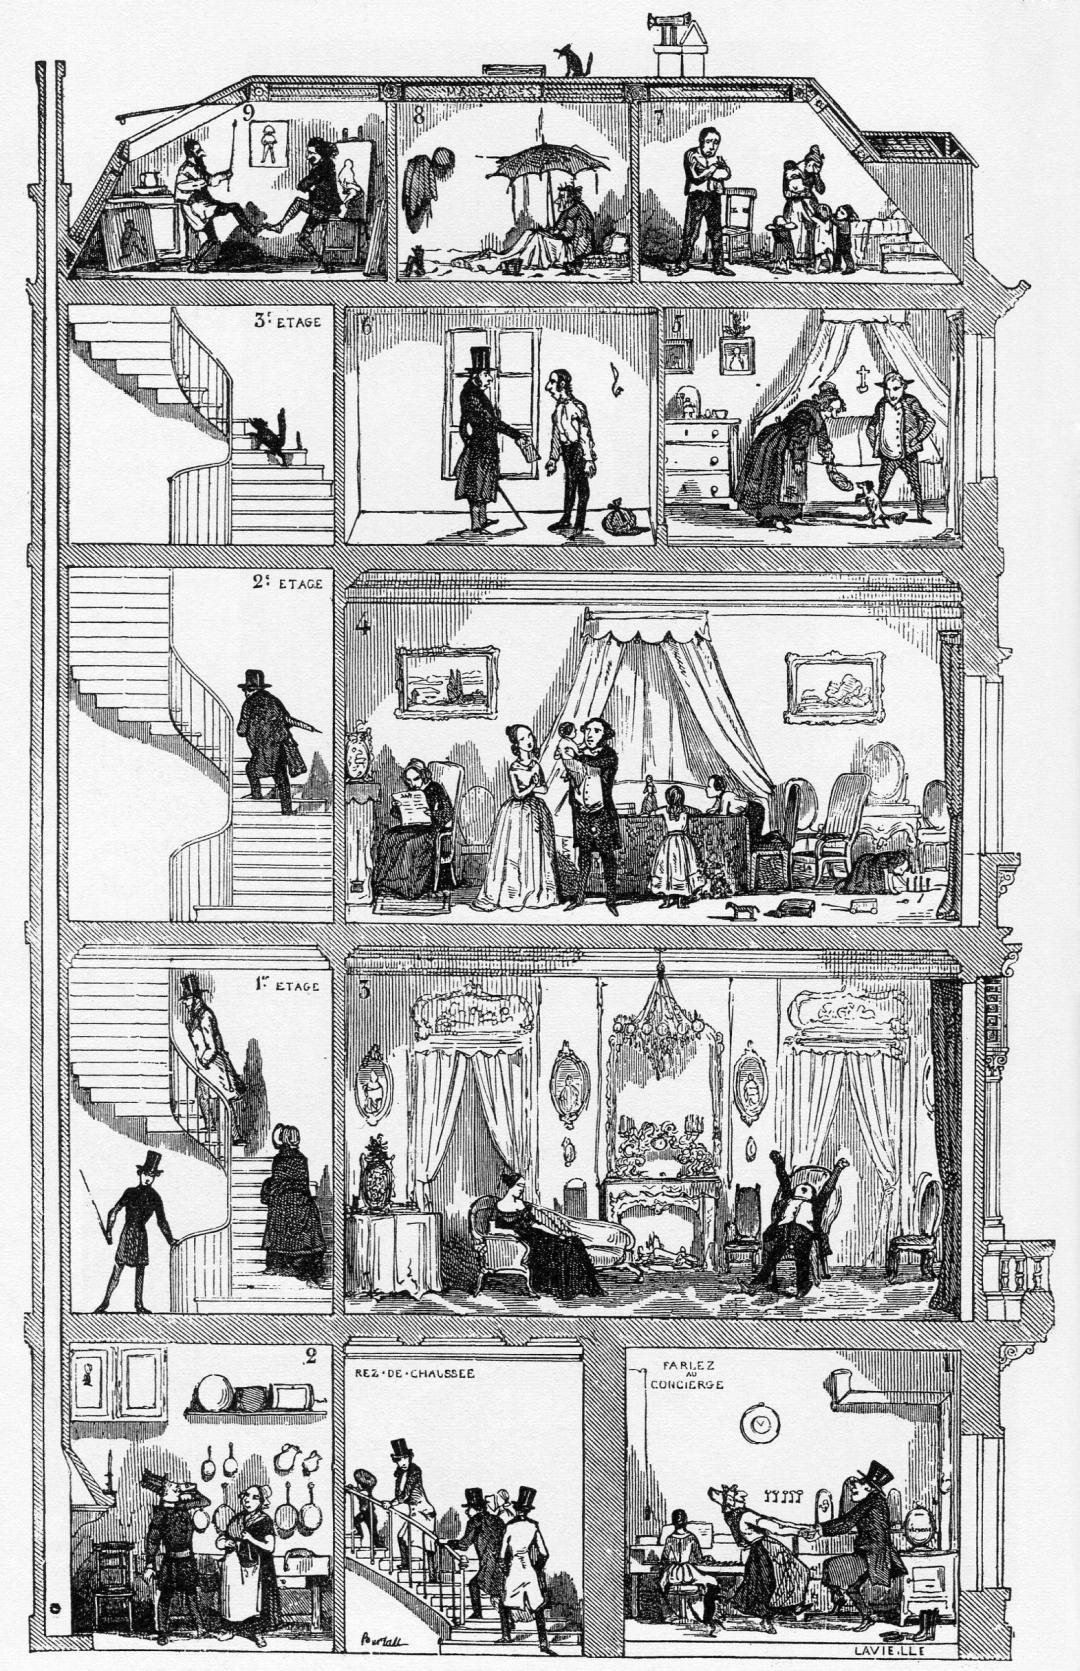 Paris vernacular cartoon by Edmond Texier : Tableau de Paris 1852